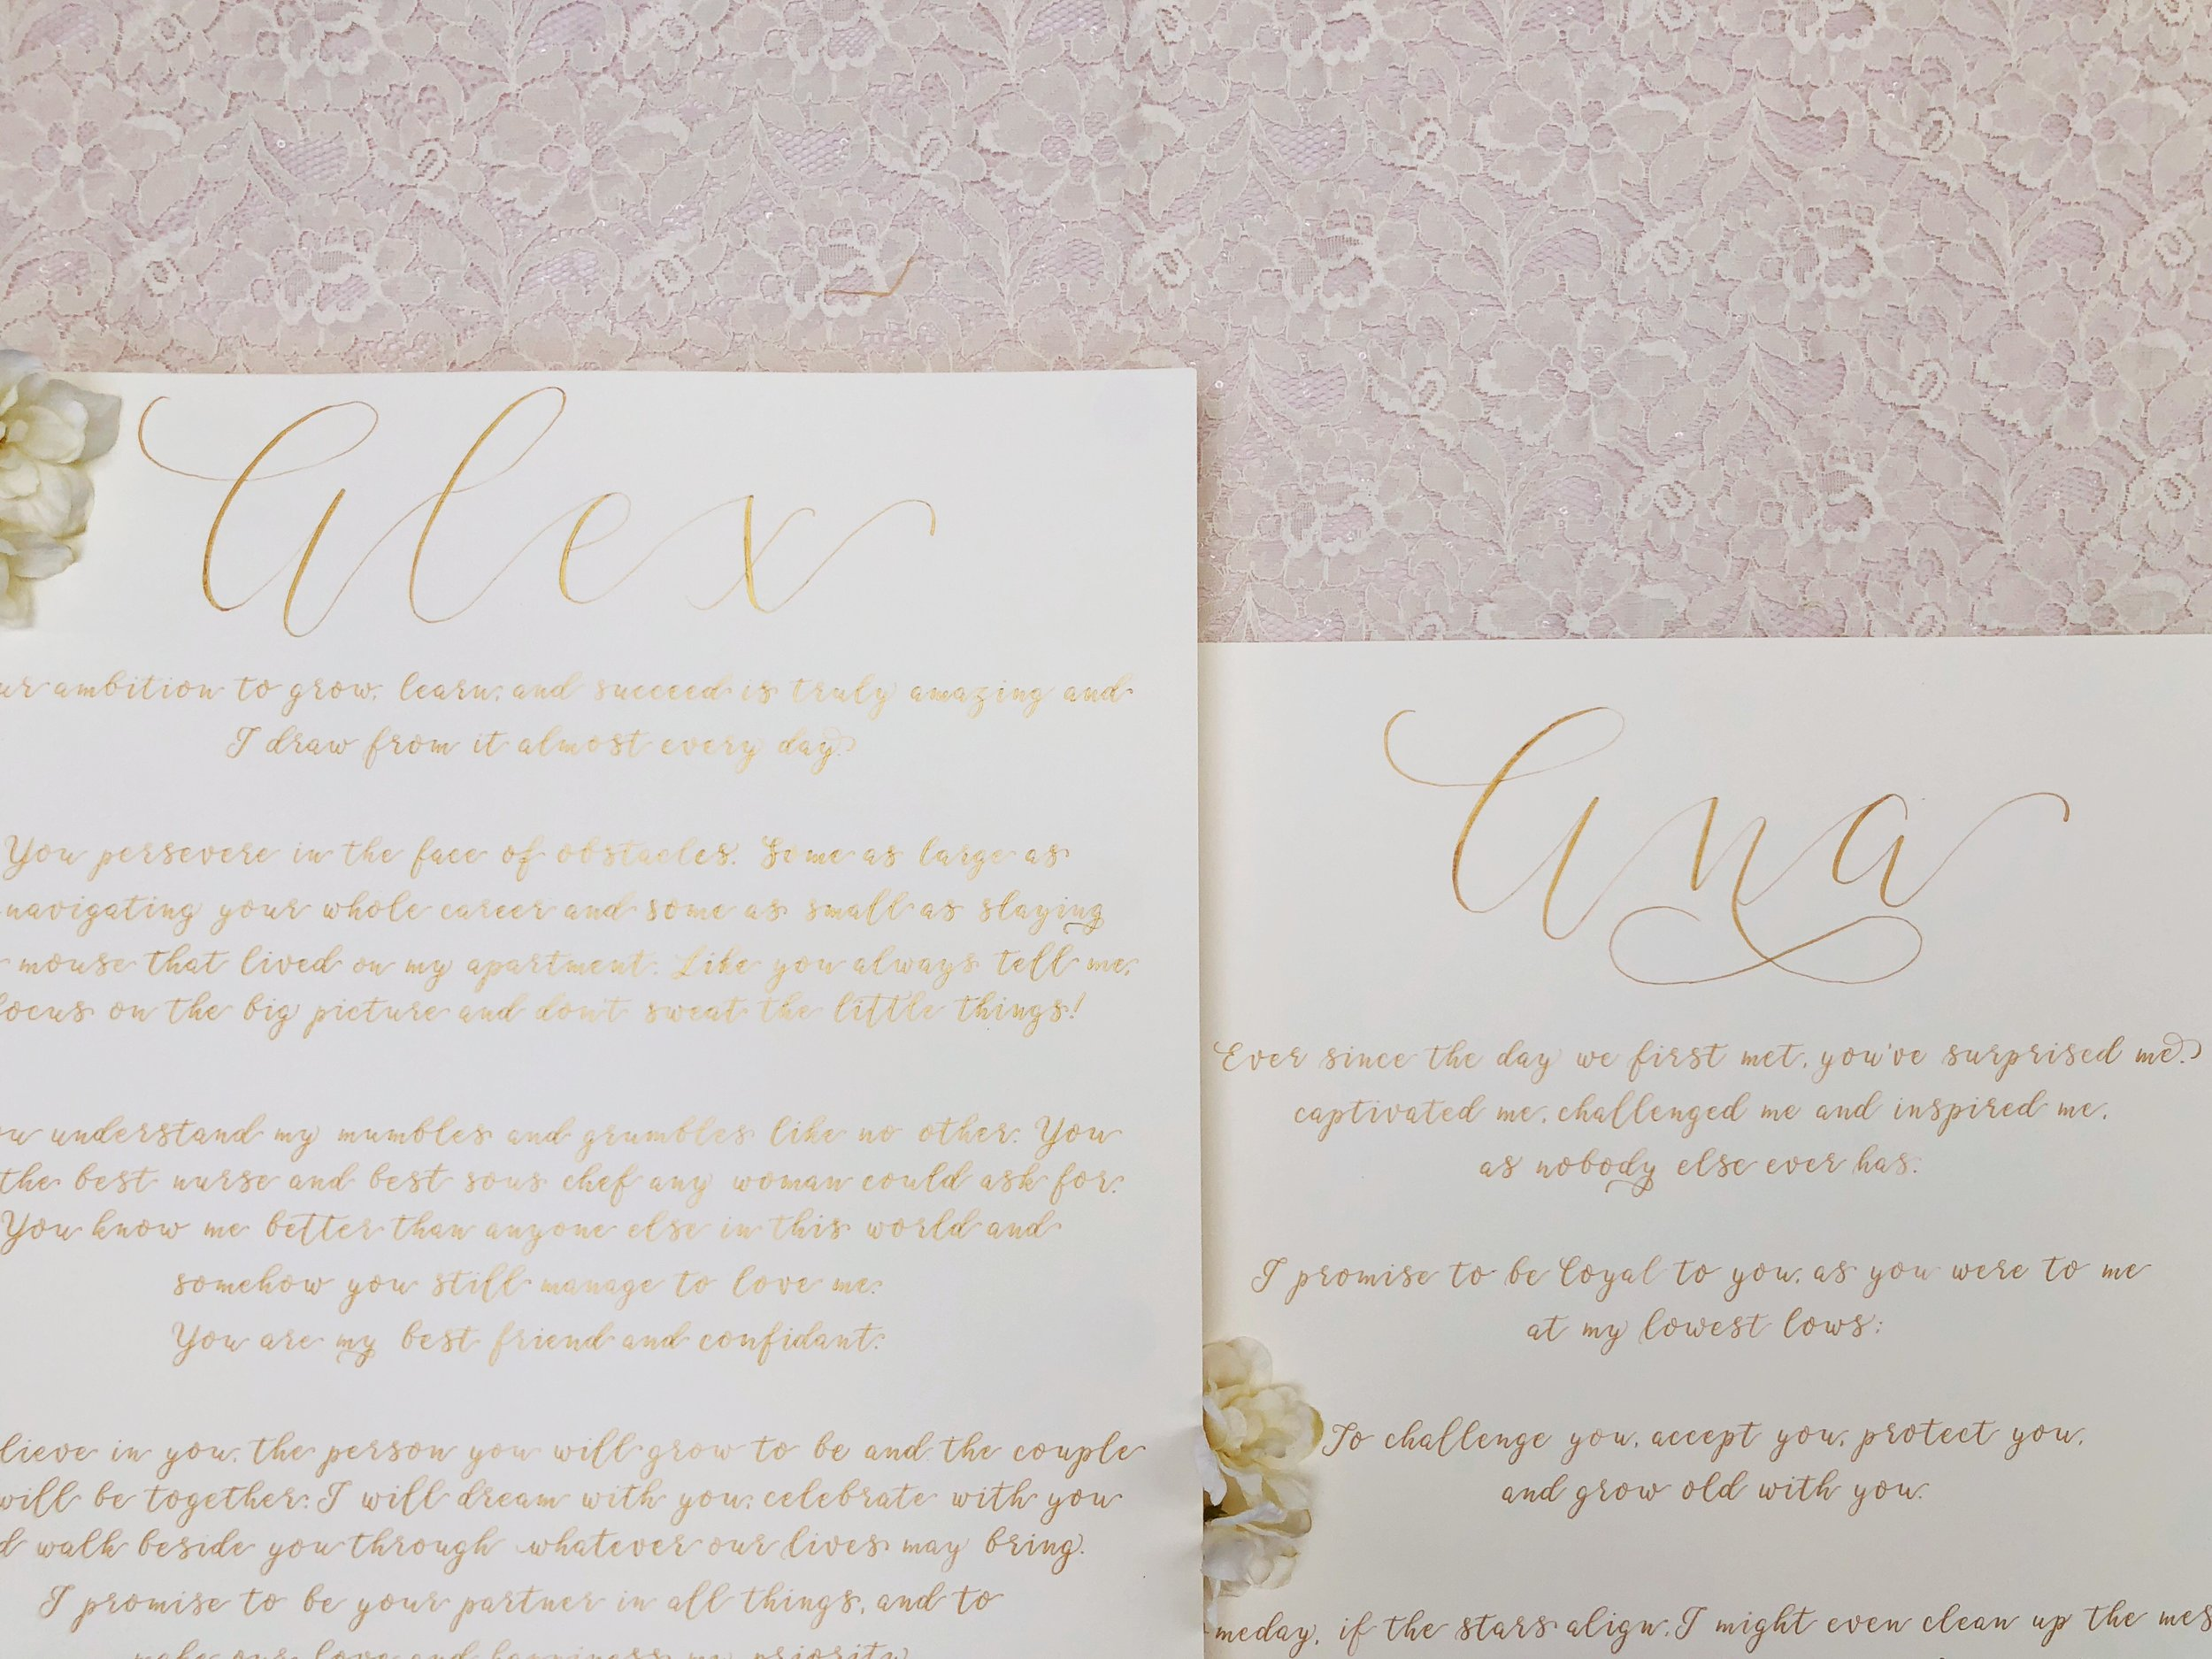 Central PA, York PA, JesSmith Designs, custom, wedding, invitations, bridal, Harrisburg, hanover, calligraphy, baltimore, wedding invitations, lancaster, gettysburg, 06-17 07.54.09.jpg